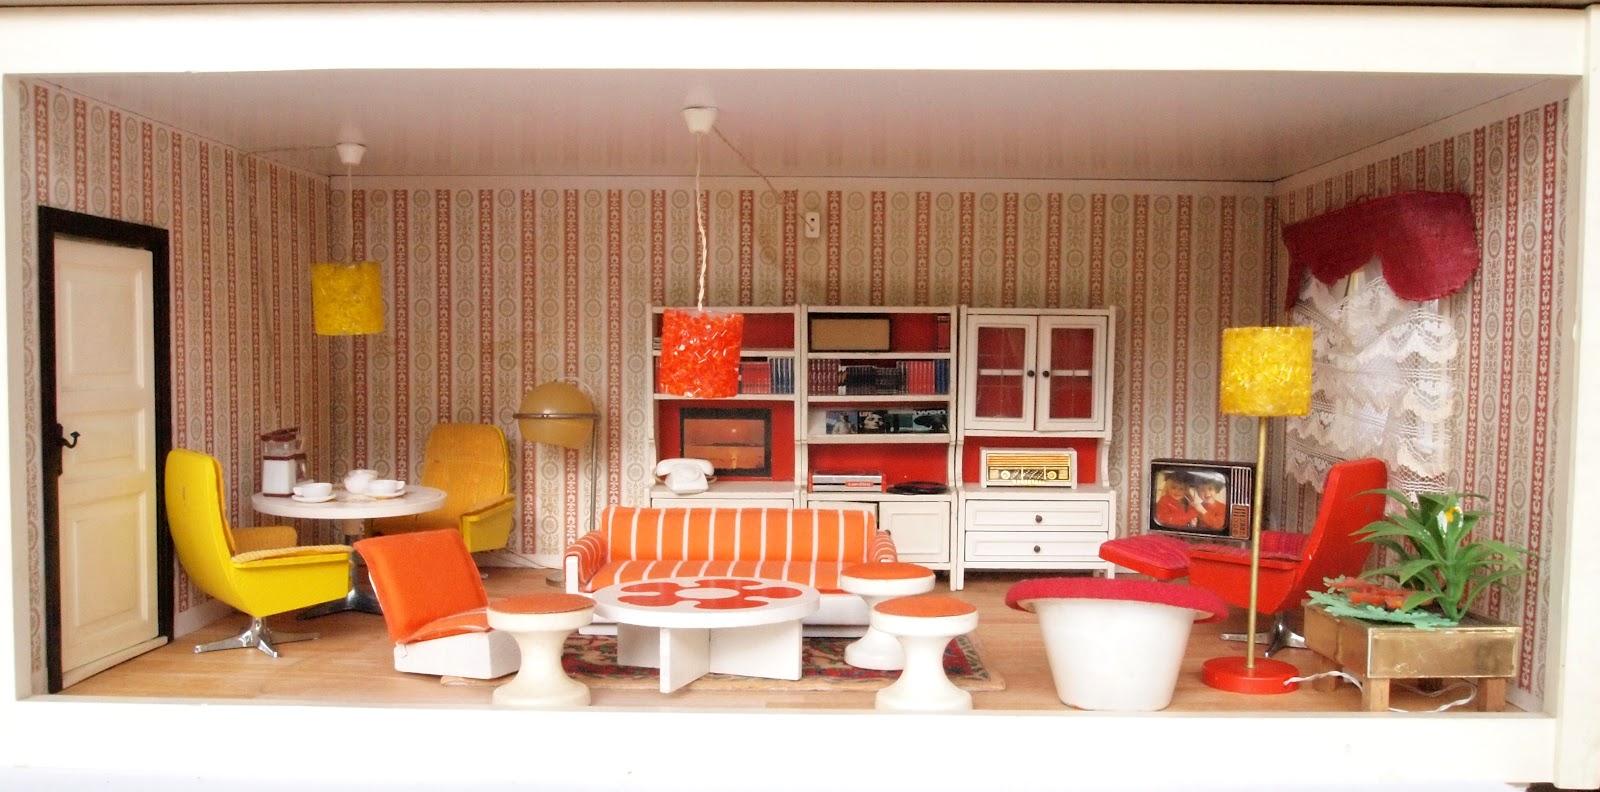 diepuppenstubensammlerin hanse lisa lundby brio. Black Bedroom Furniture Sets. Home Design Ideas